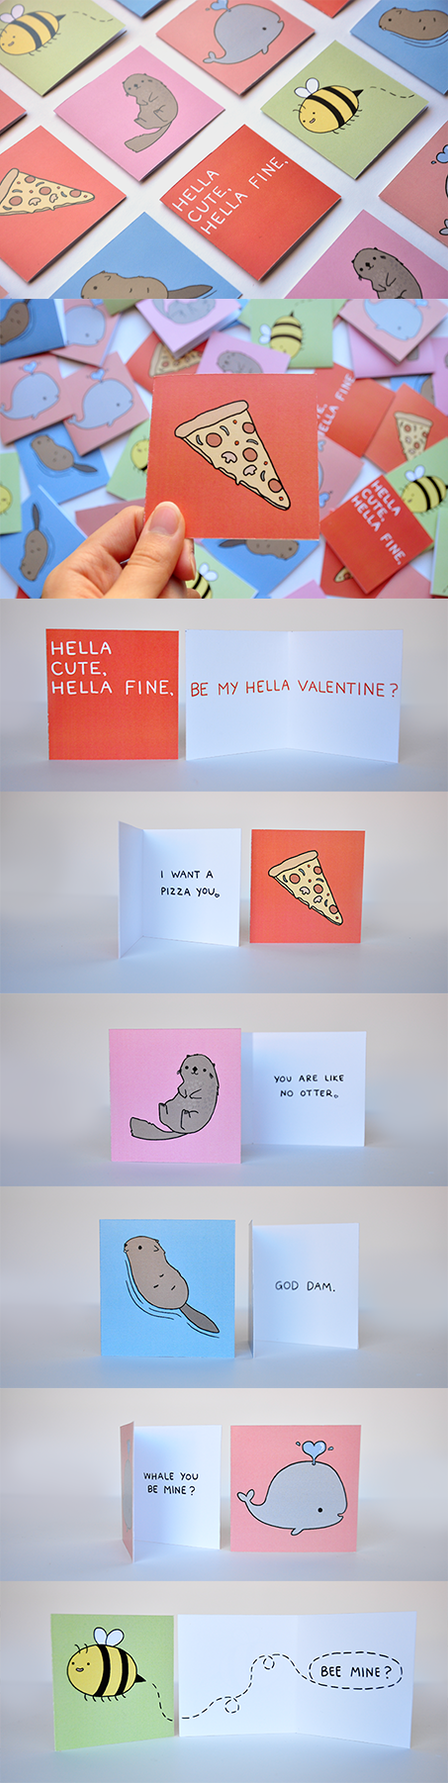 Valentine's Day 2014 by pikarar